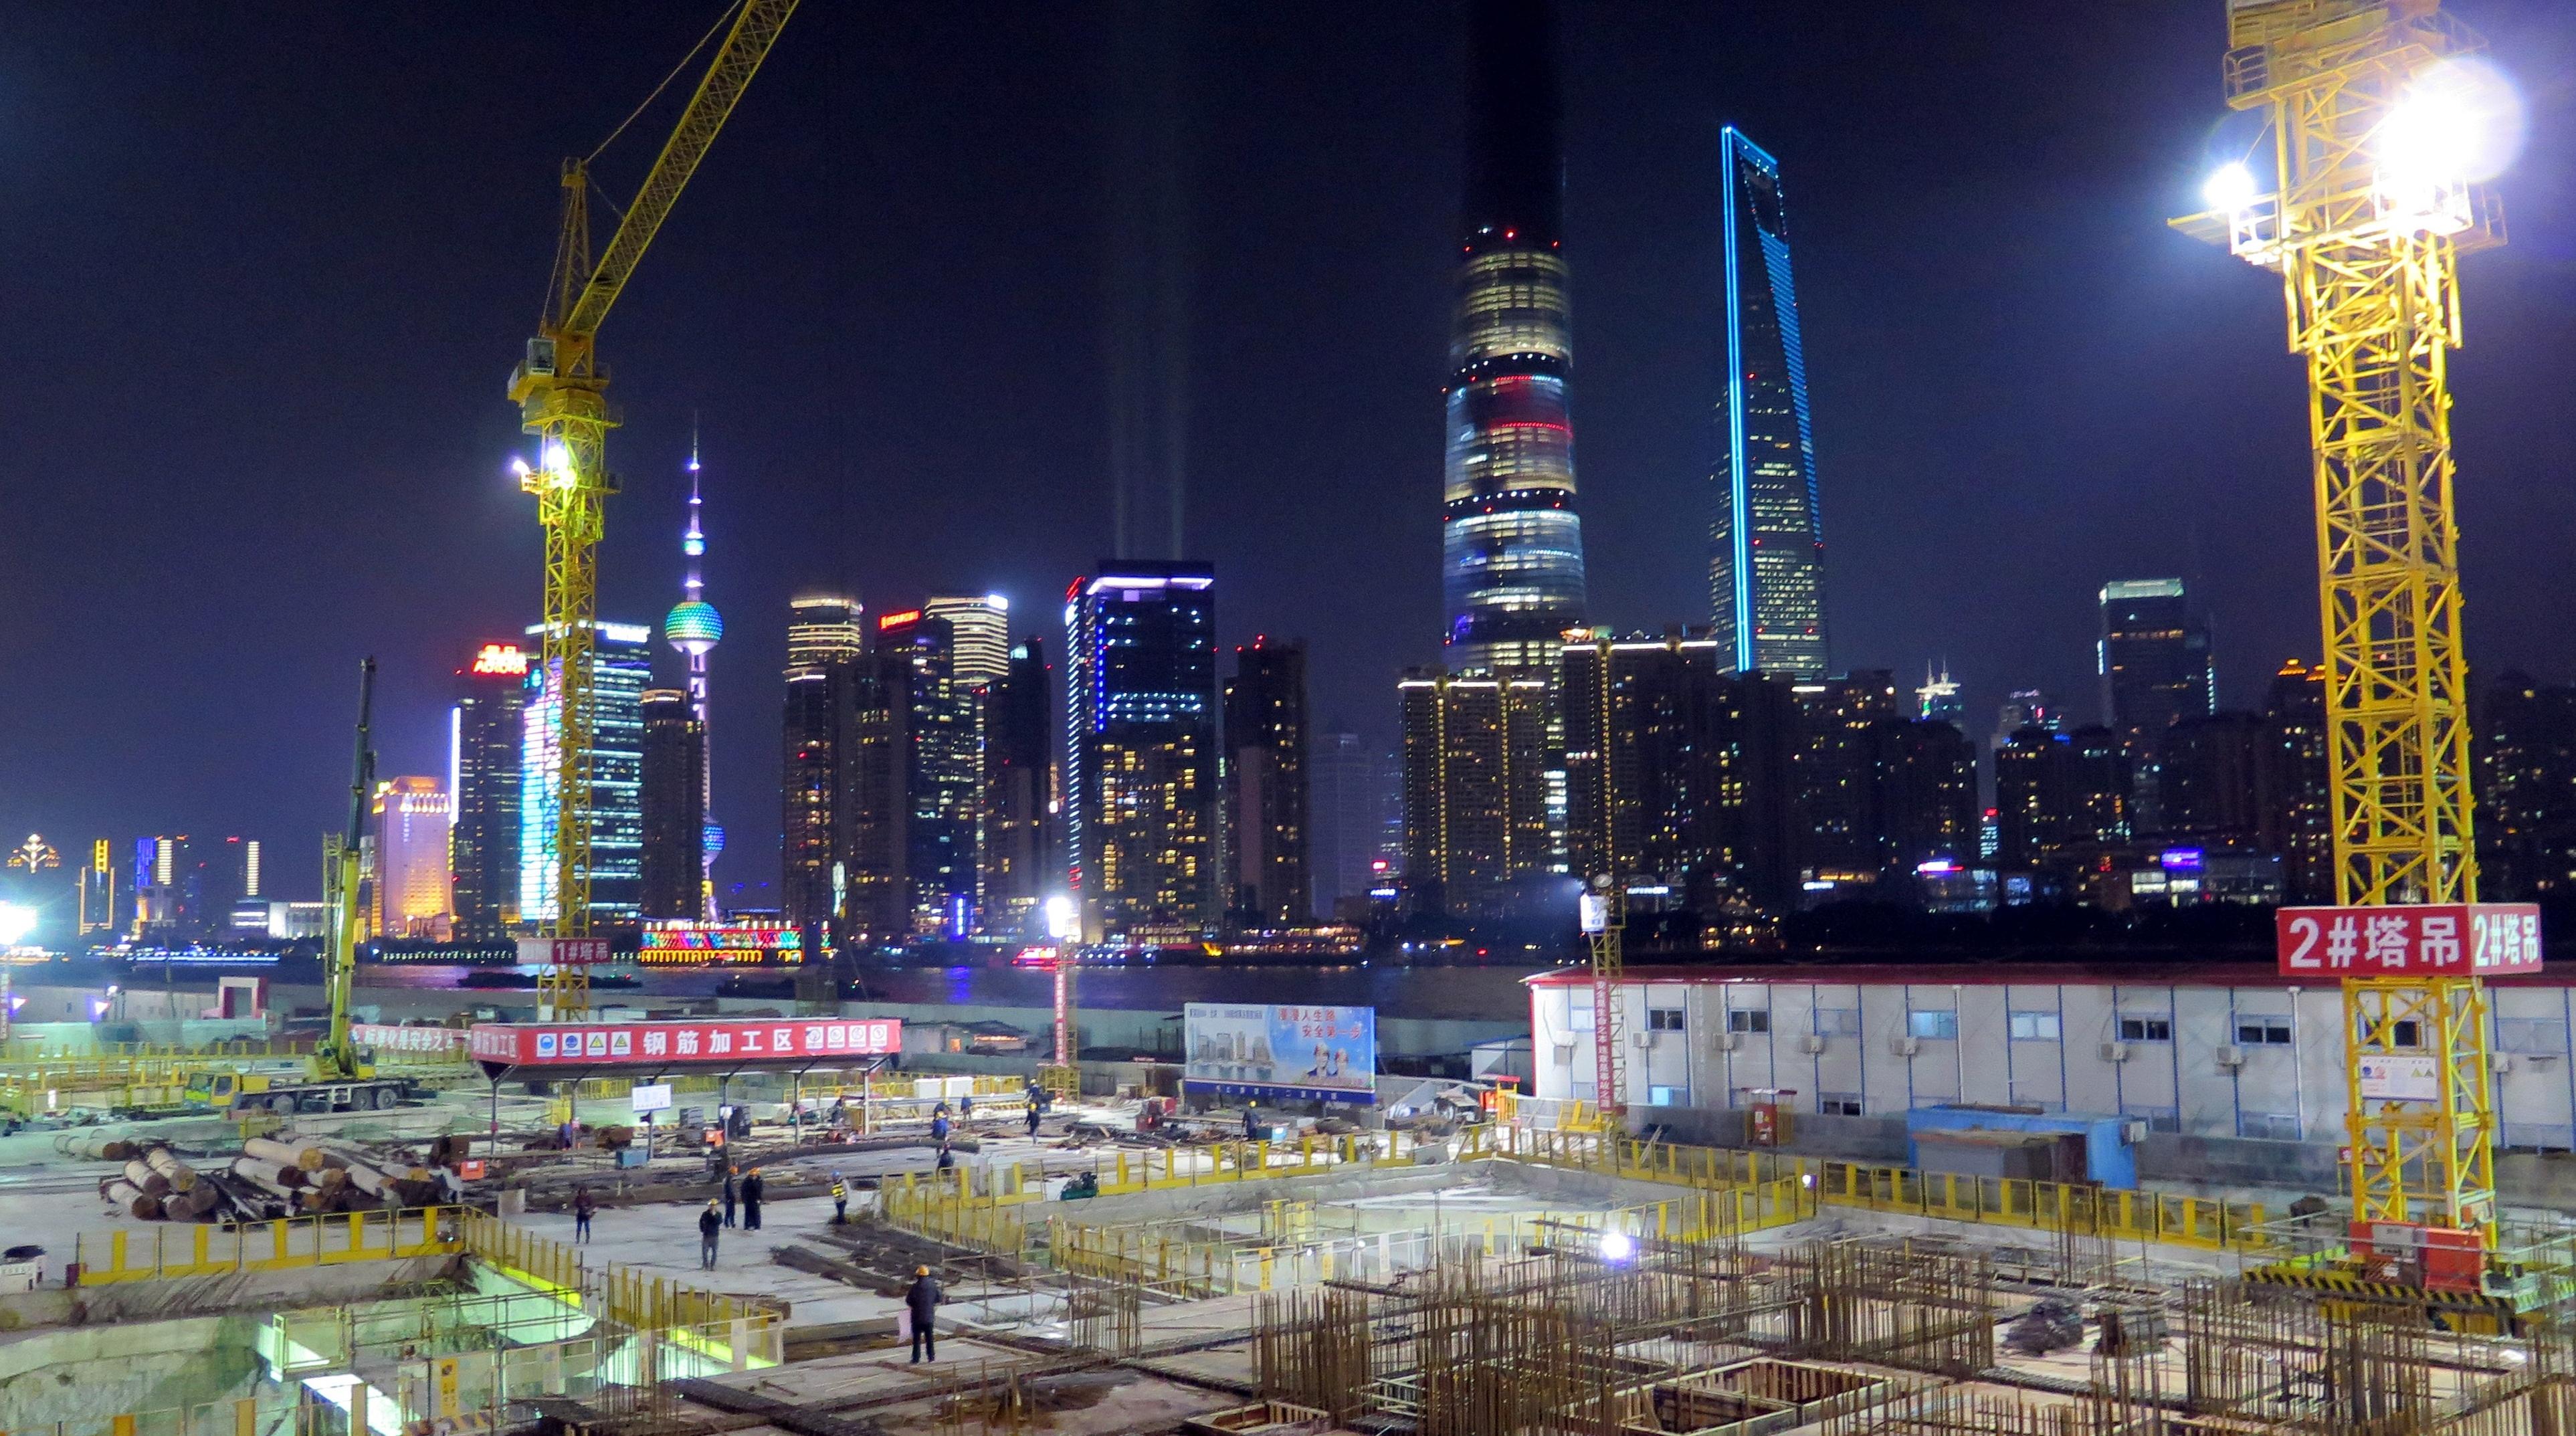 Building site in Shanghai